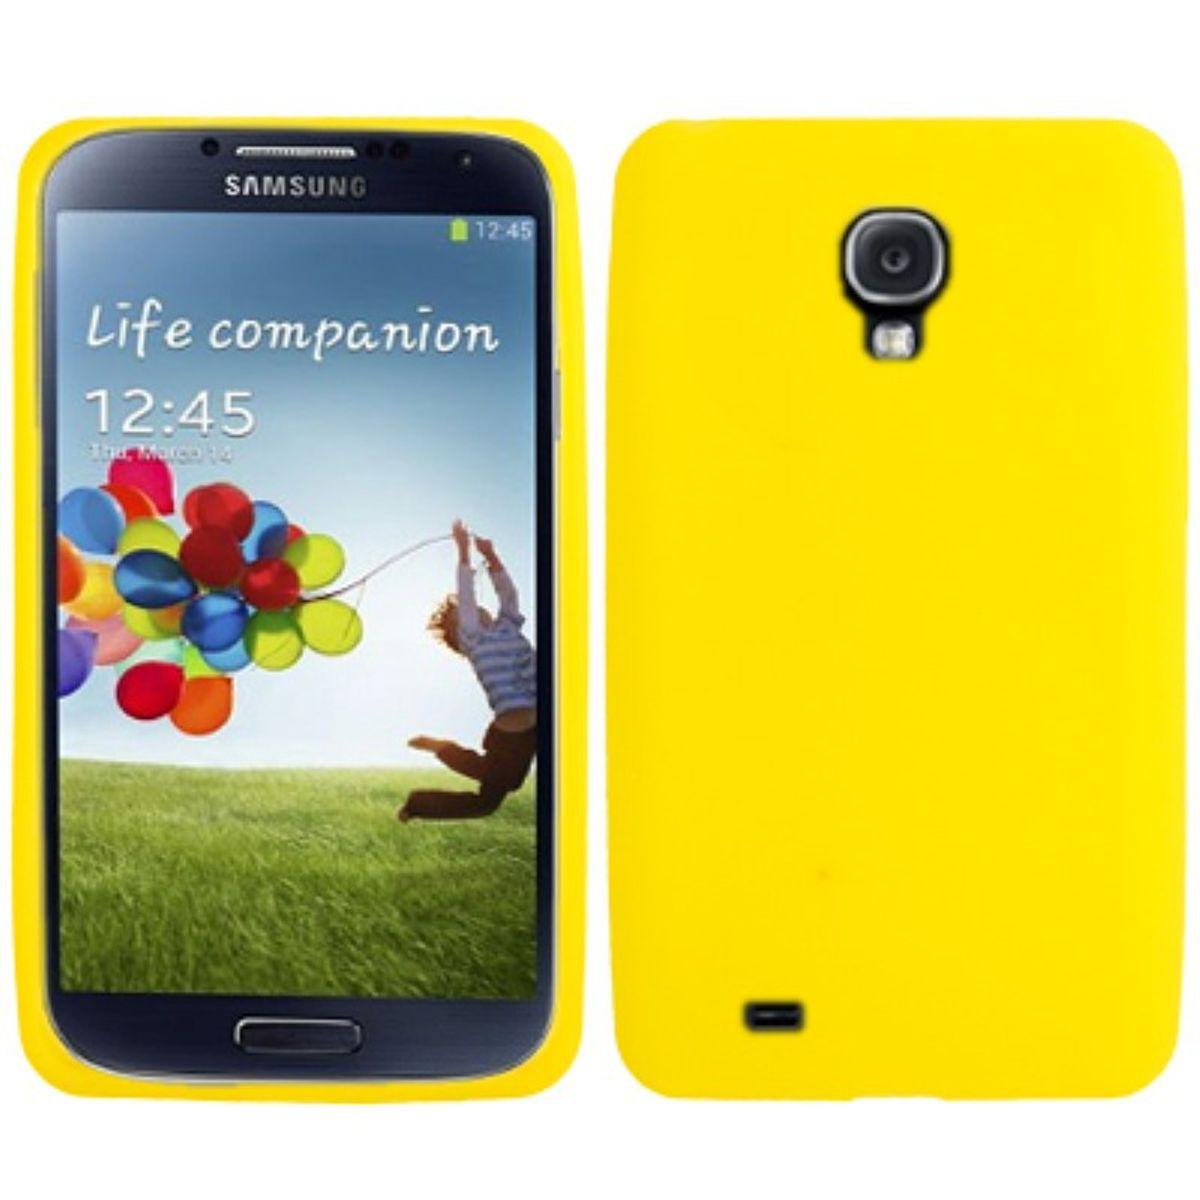 Schutzhülle Silikon Case für Handy Samsung Galaxy S4 GT-I9500 / GT-I9505 / LTE+ GT-I9506 / Value Edition GT-I9515 gelb